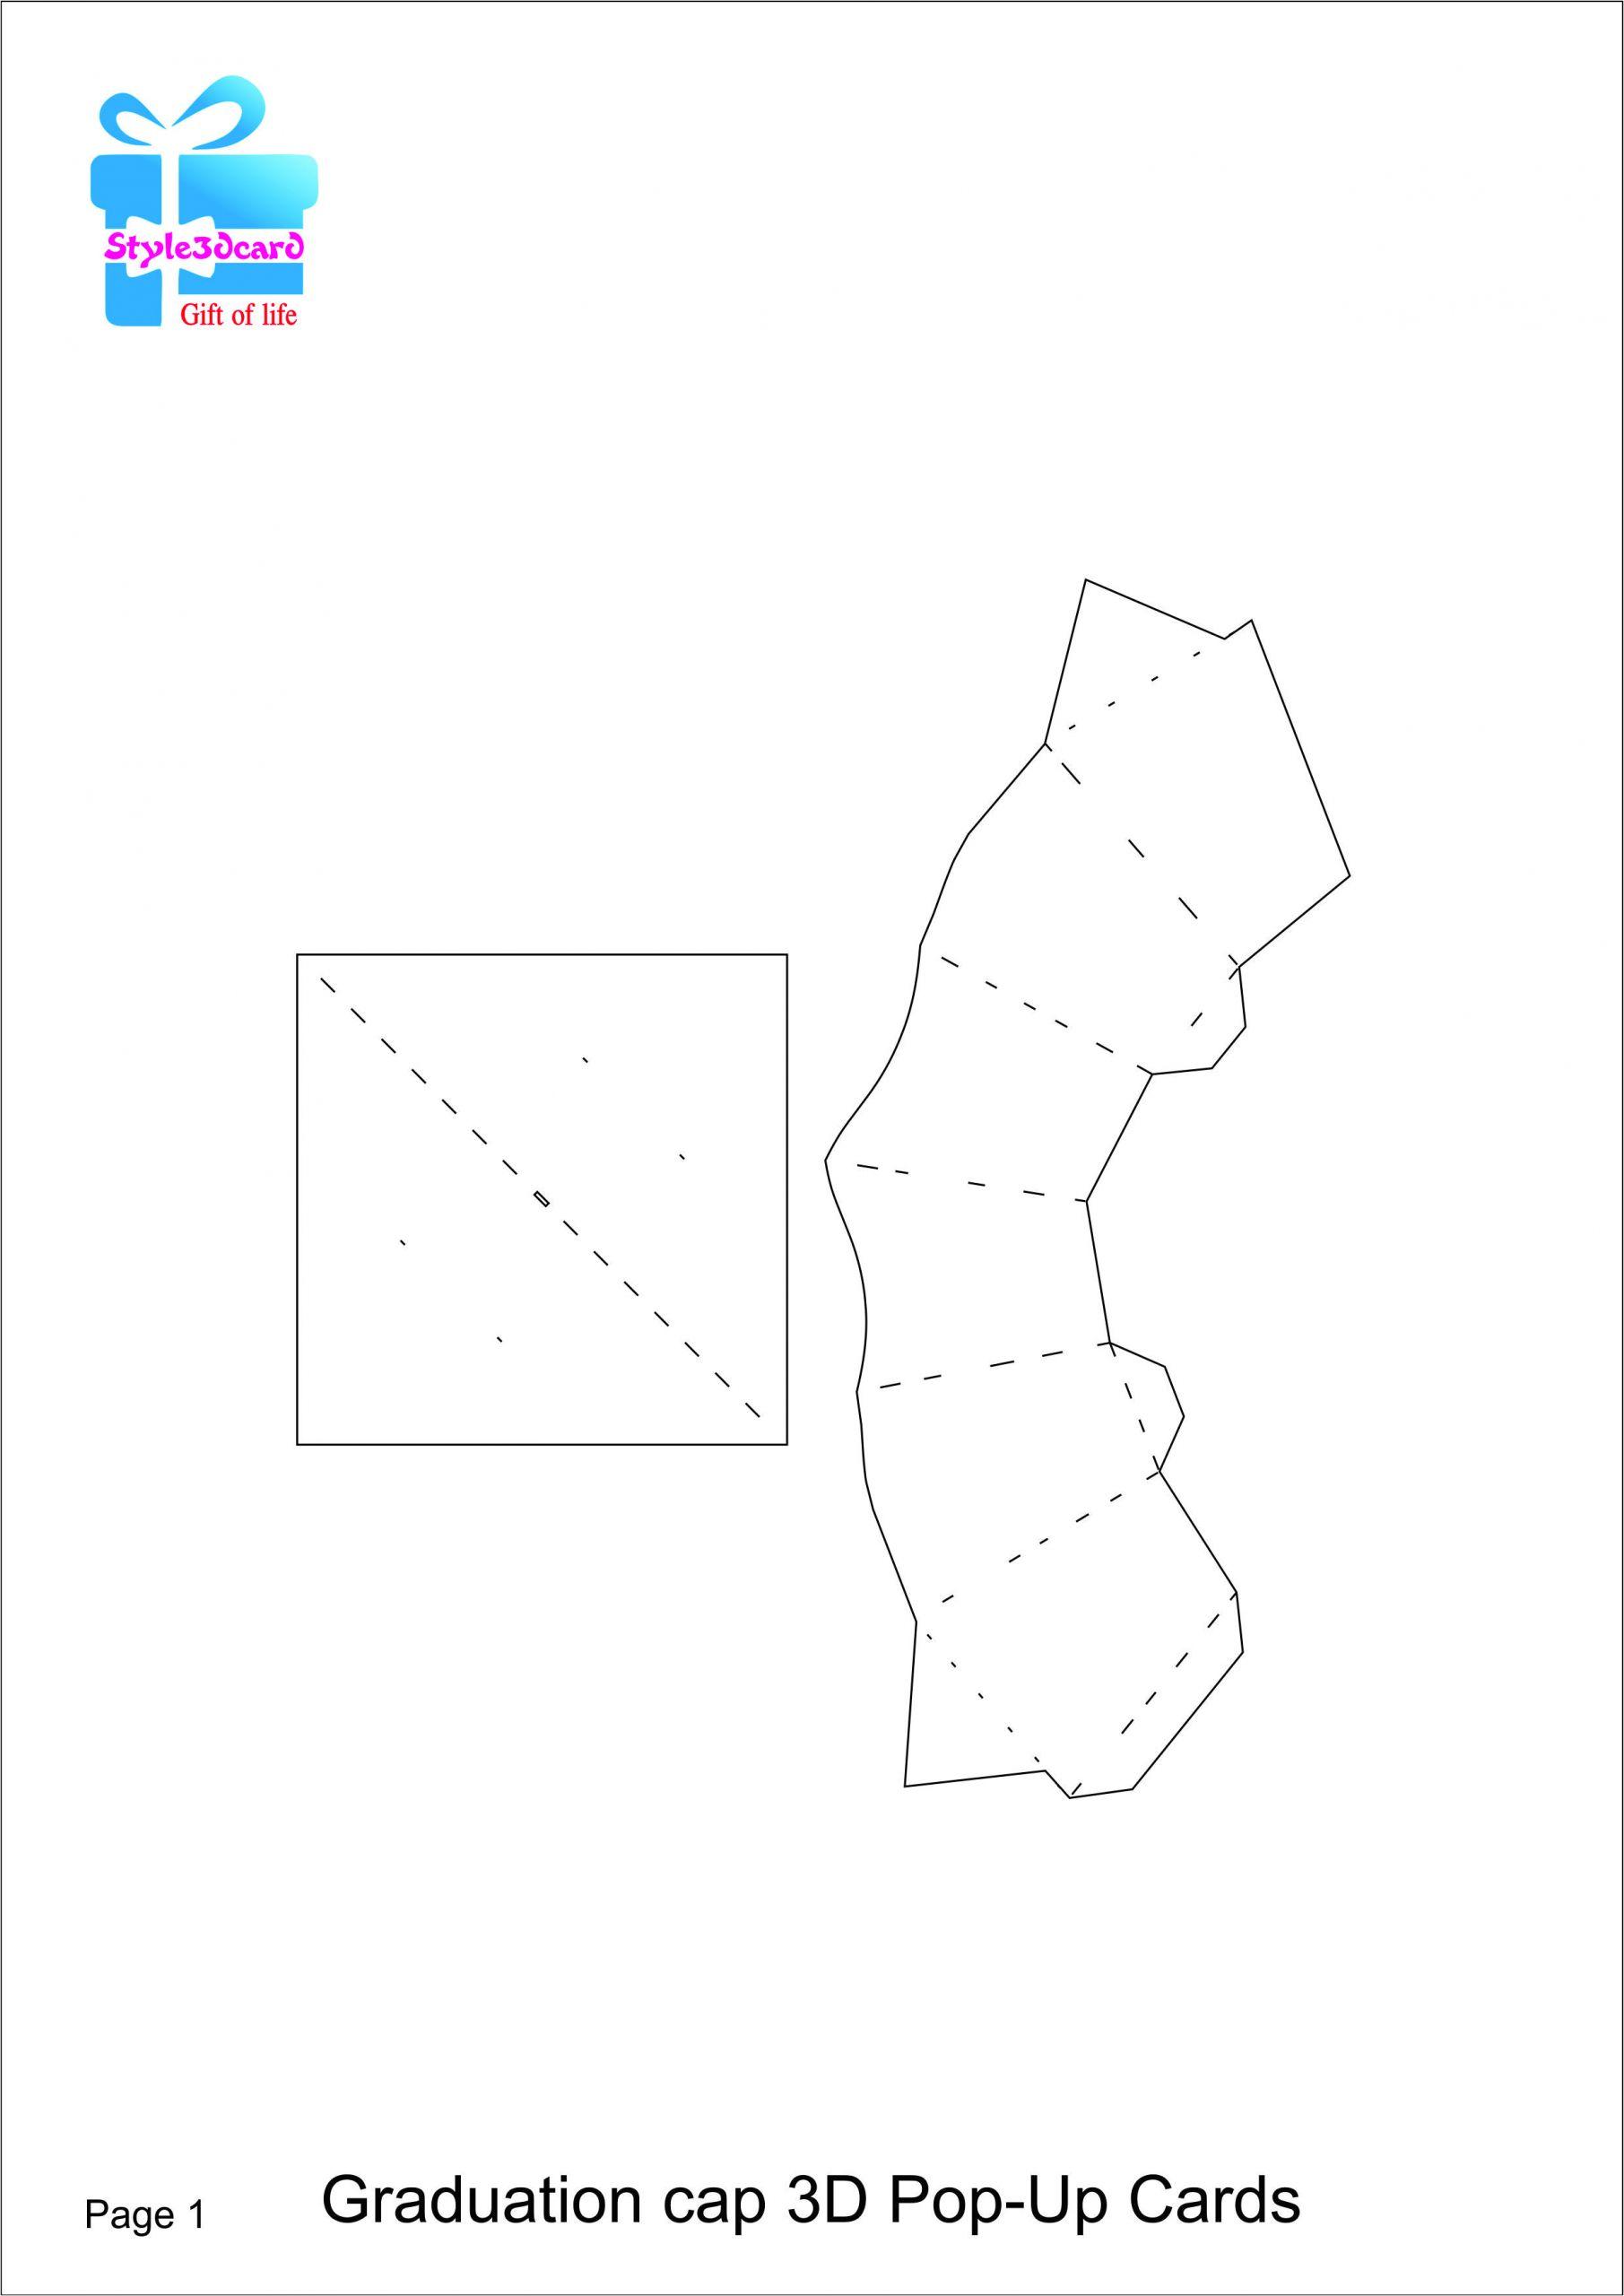 Teachers Day Pop Up Card Template Graduation Cap 3d Pop Up Card Kirigami Pattern 1 with